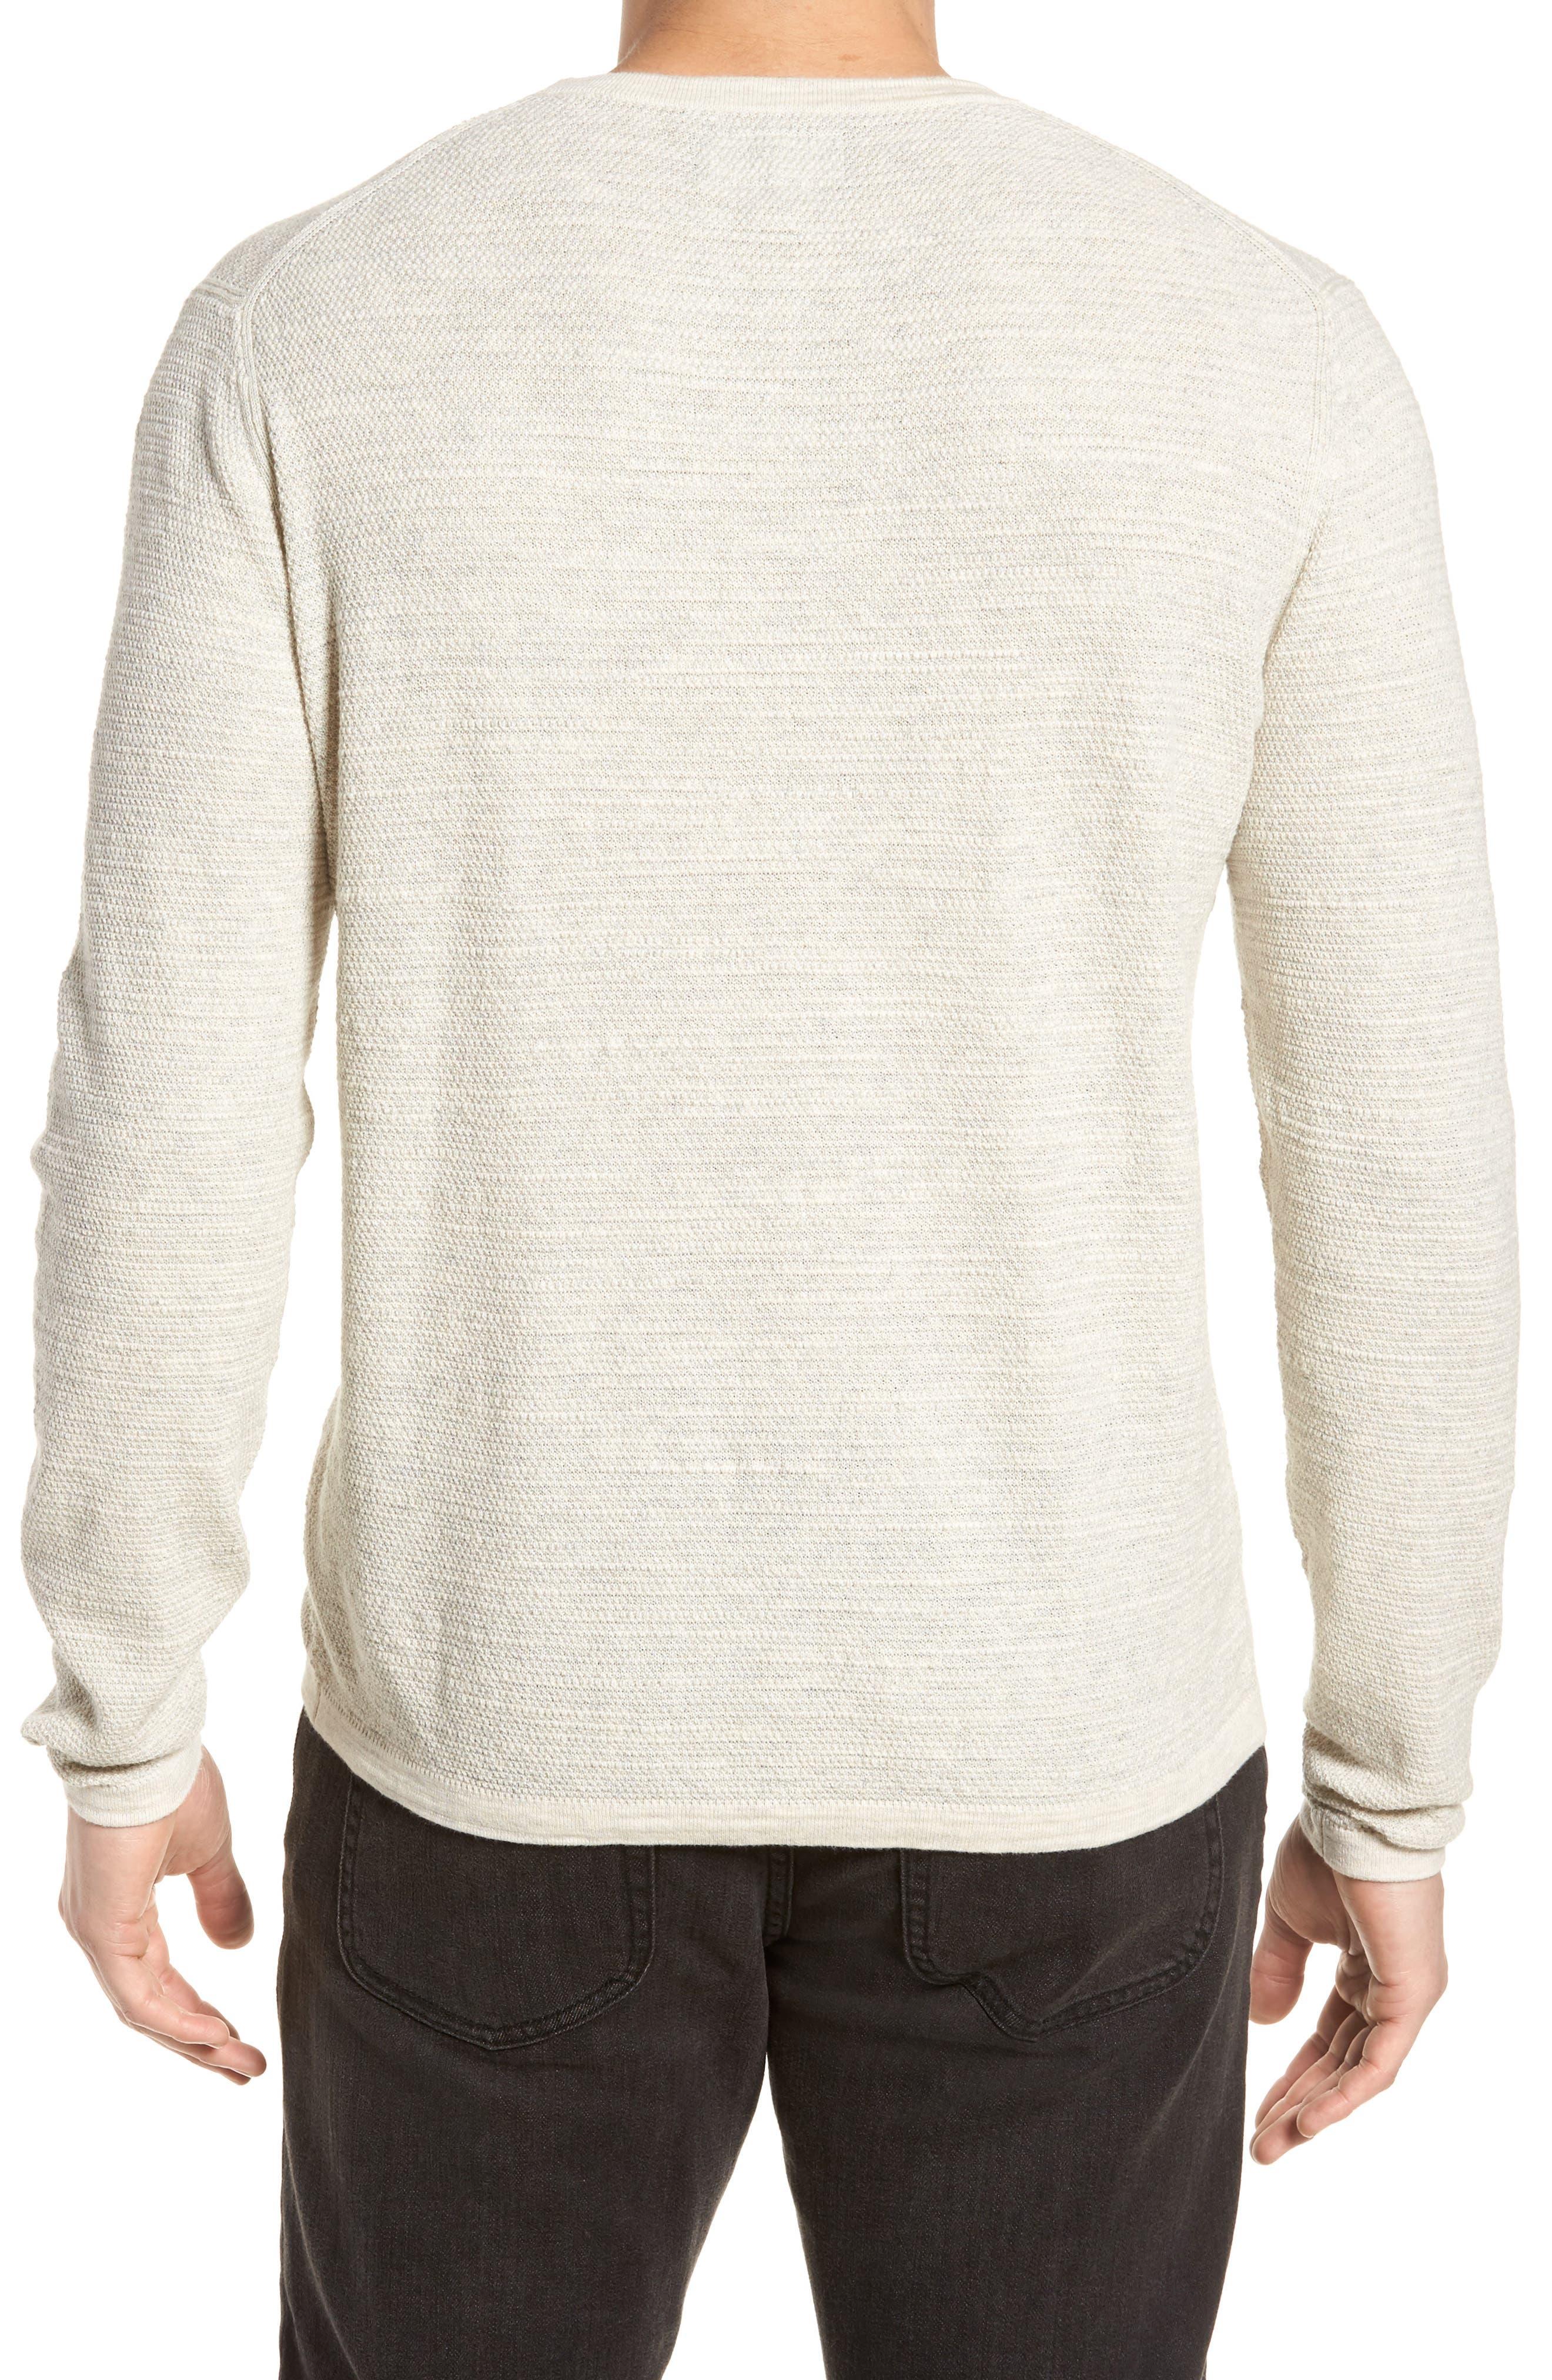 Slub Thermal Knit Sweater,                             Alternate thumbnail 2, color,                             Cream Heather